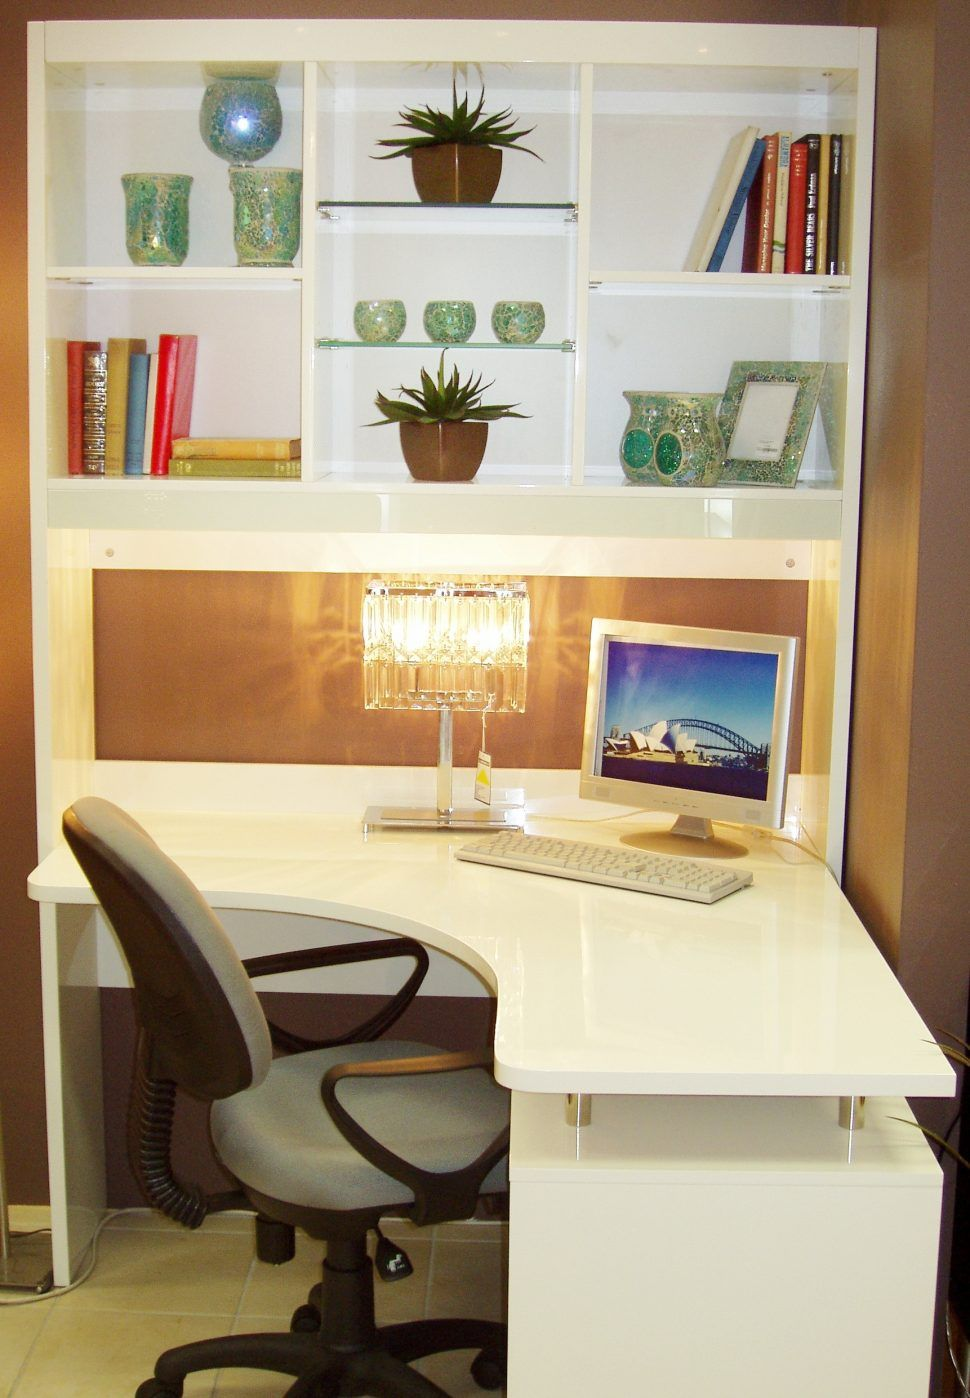 rustic home office furniture. 99+ White Corner Desk With Shelves - Rustic Home Office Furniture Check More At Http